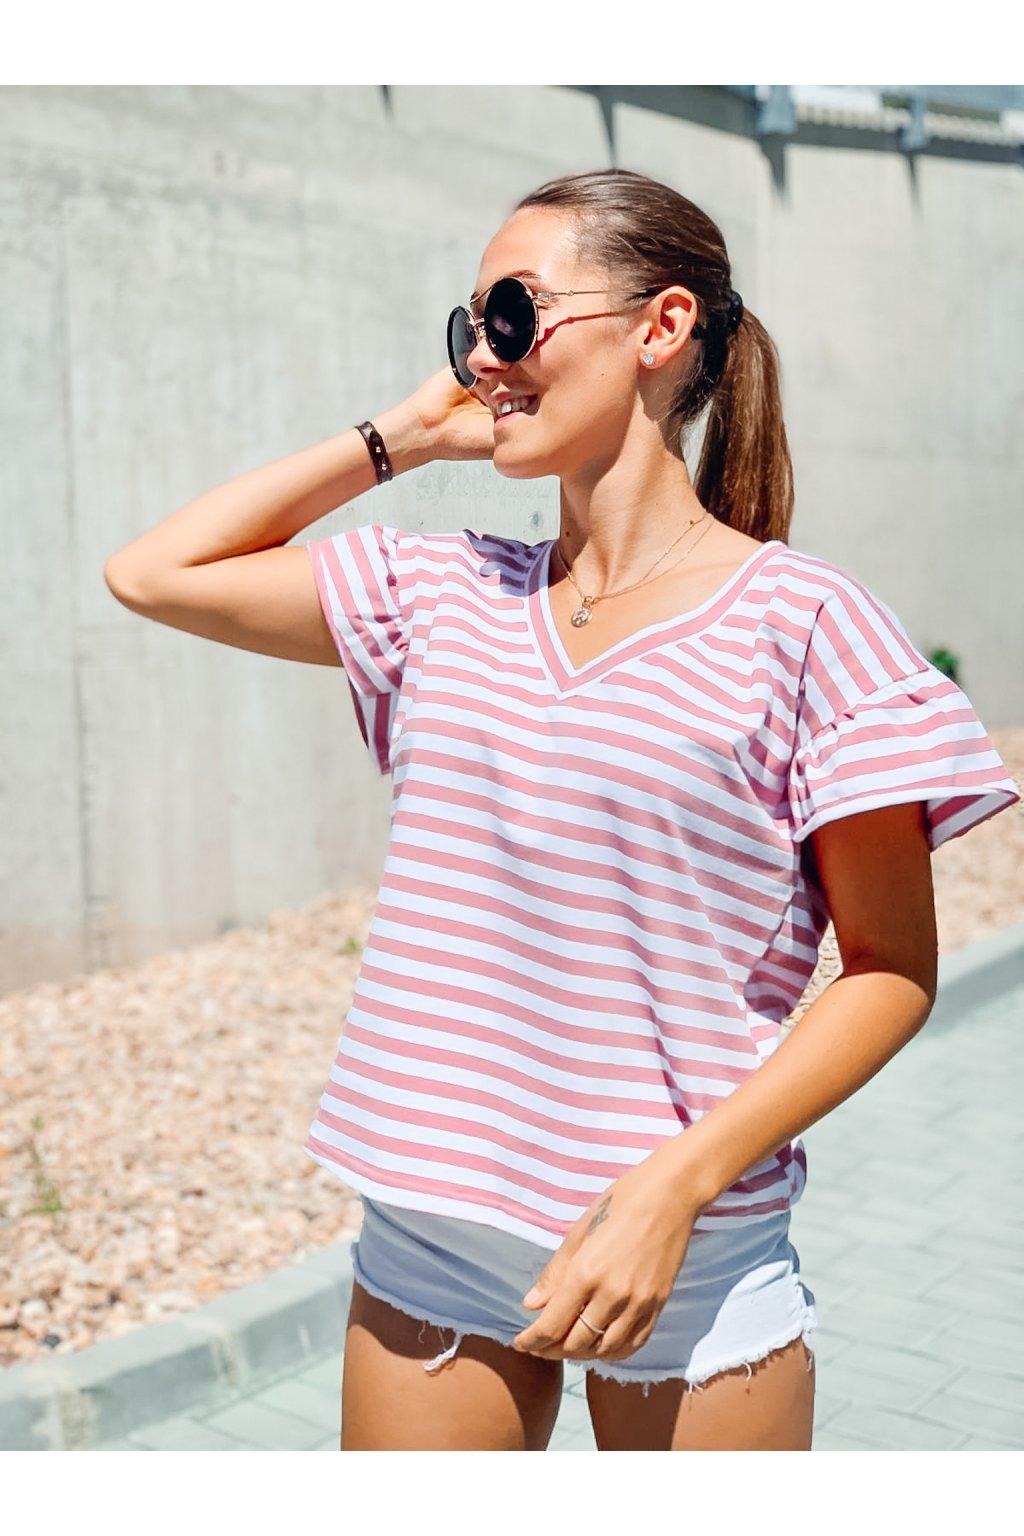 damske tricko s volanovymi rukavy stripe pink eshopat cz 1